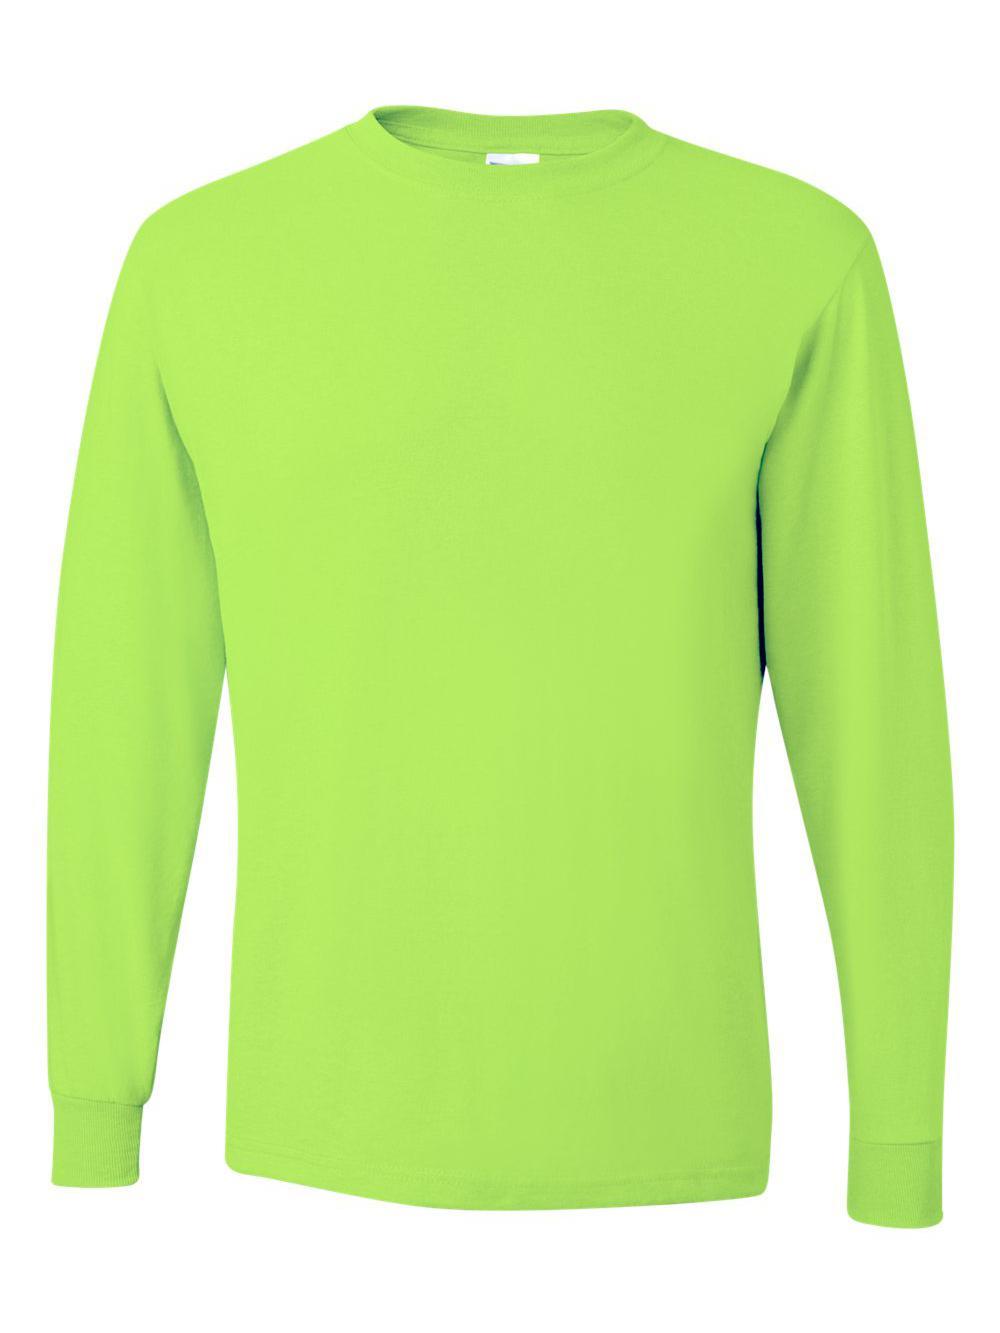 Jerzees-Dri-Power-Long-Sleeve-50-50-T-Shirt-29LSR thumbnail 72